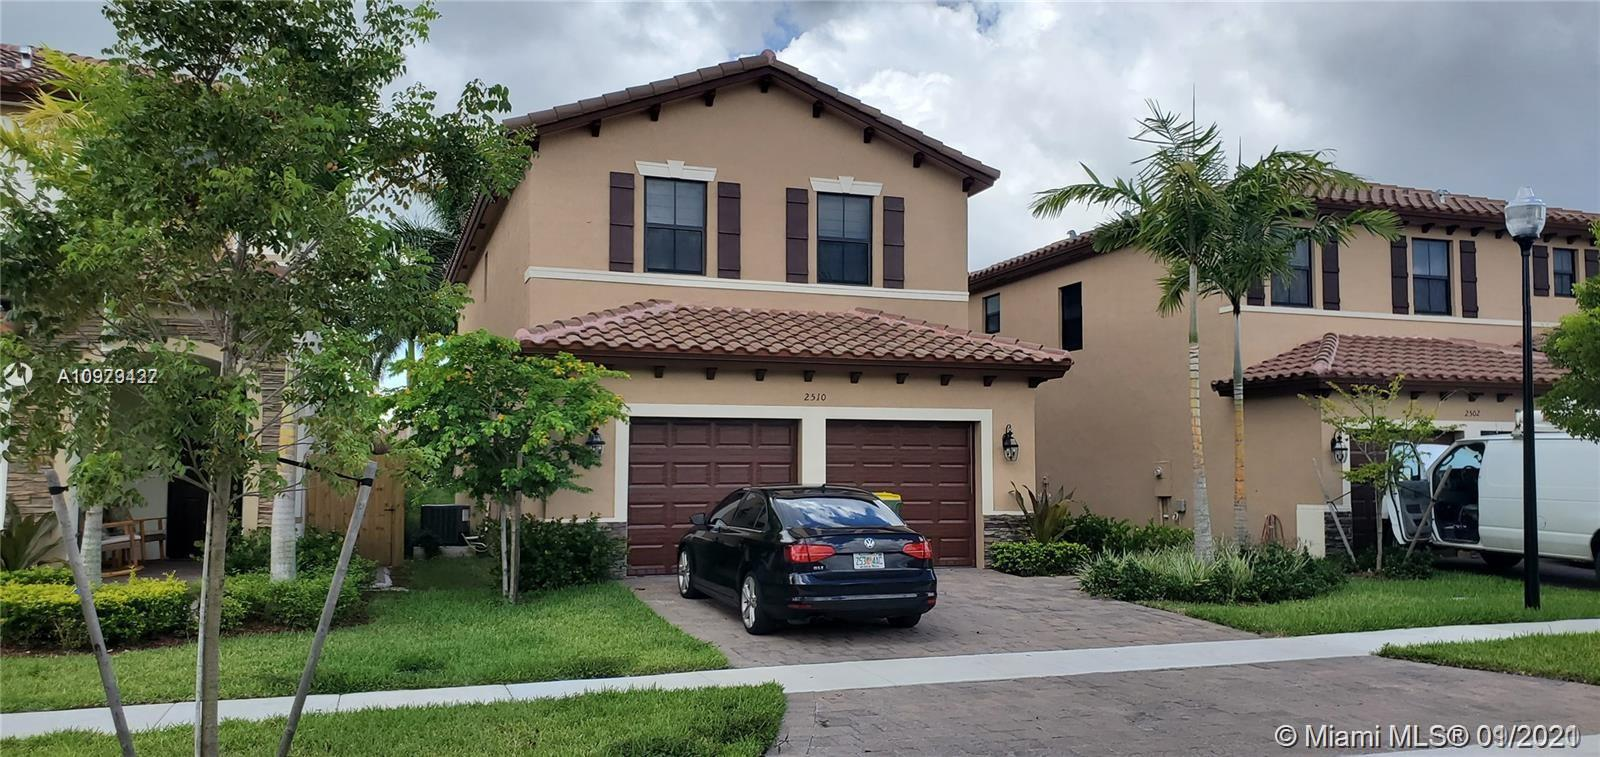 2510 NE 1st St #2510 Property Photo - Homestead, FL real estate listing